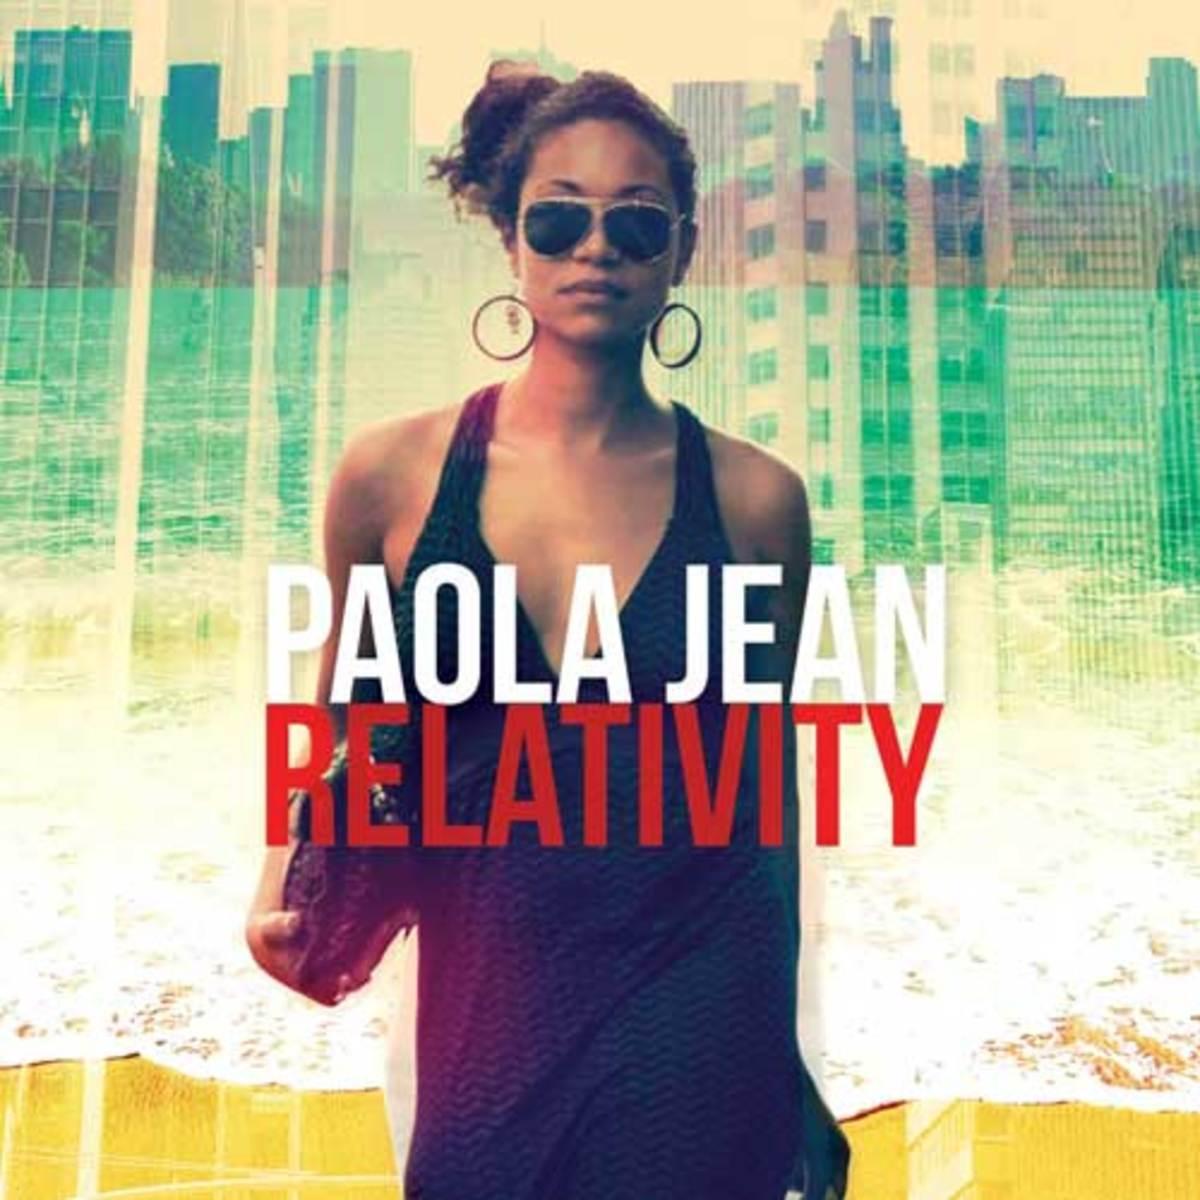 paolajean-relativity.jpg